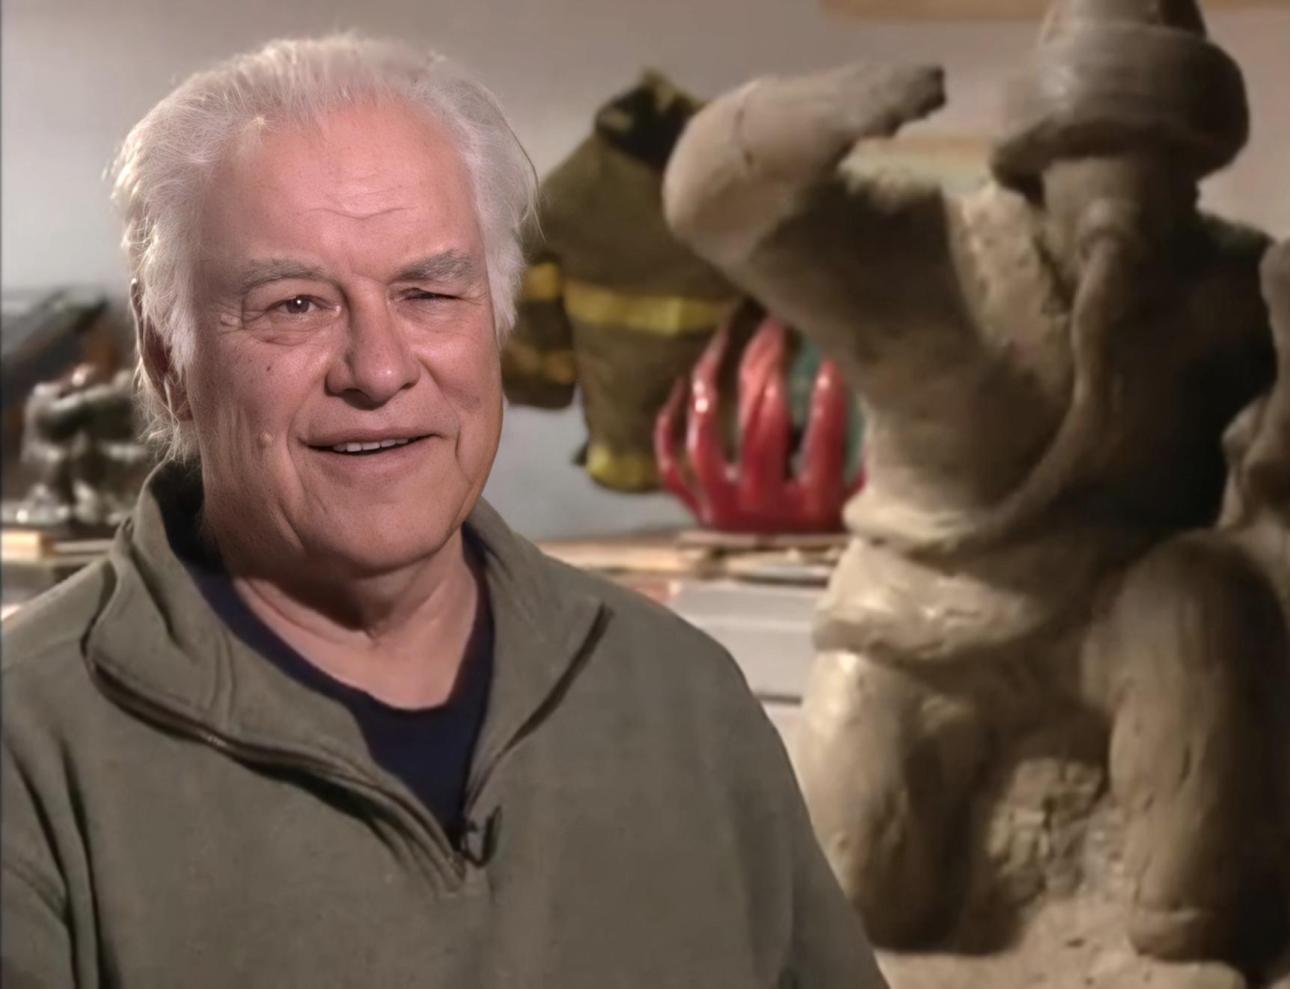 Luis Jiménez sculptor